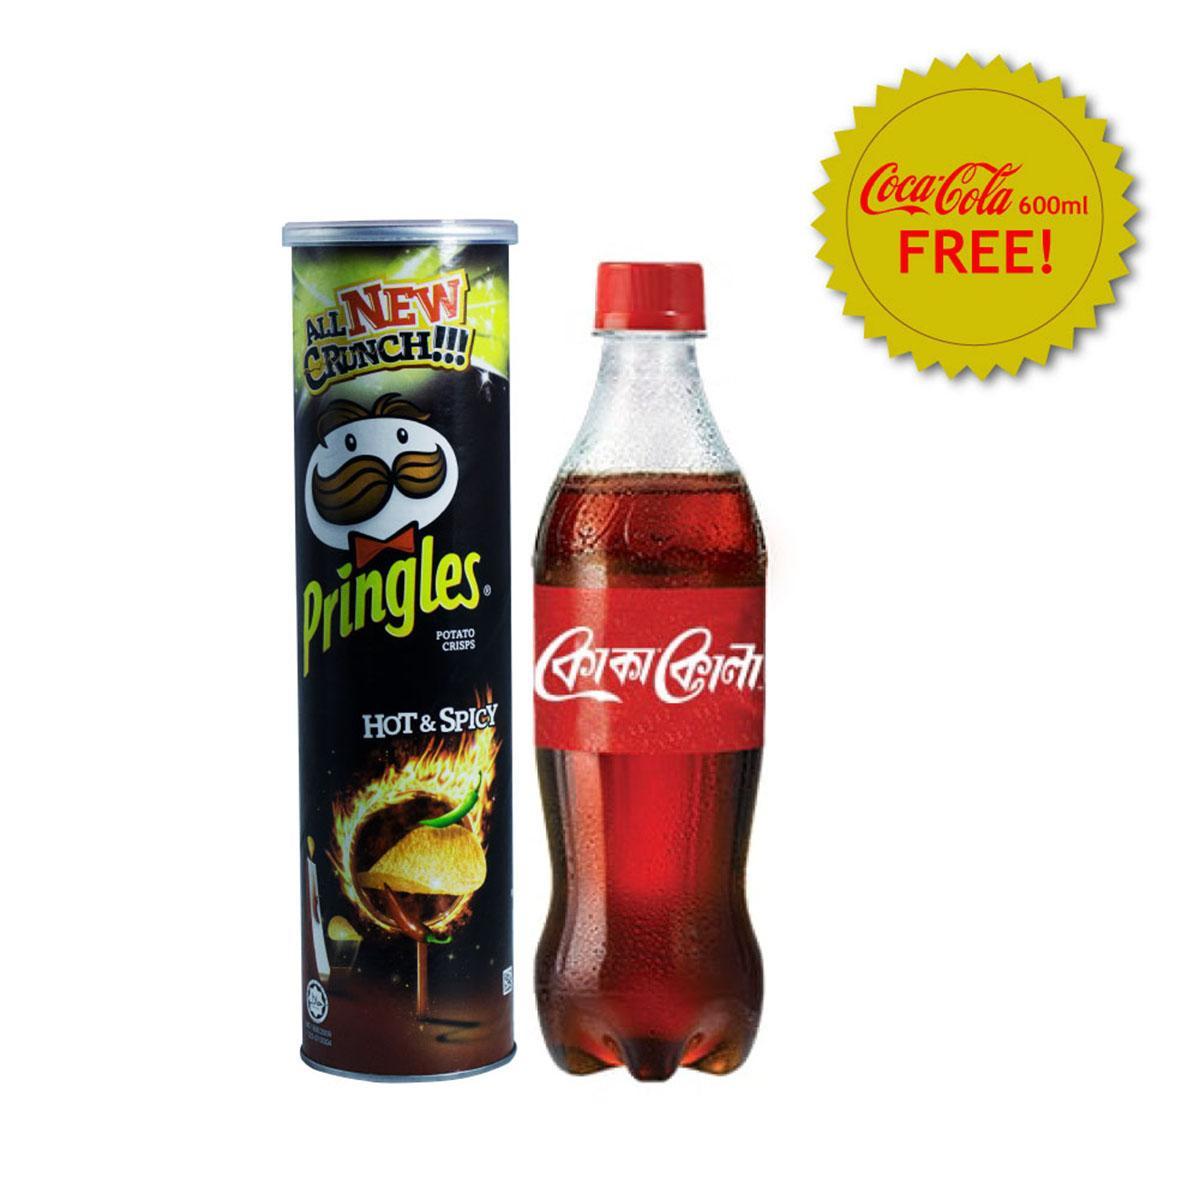 Pringles Hot & Spicy 147g (600 ml Coca-Cola Free)